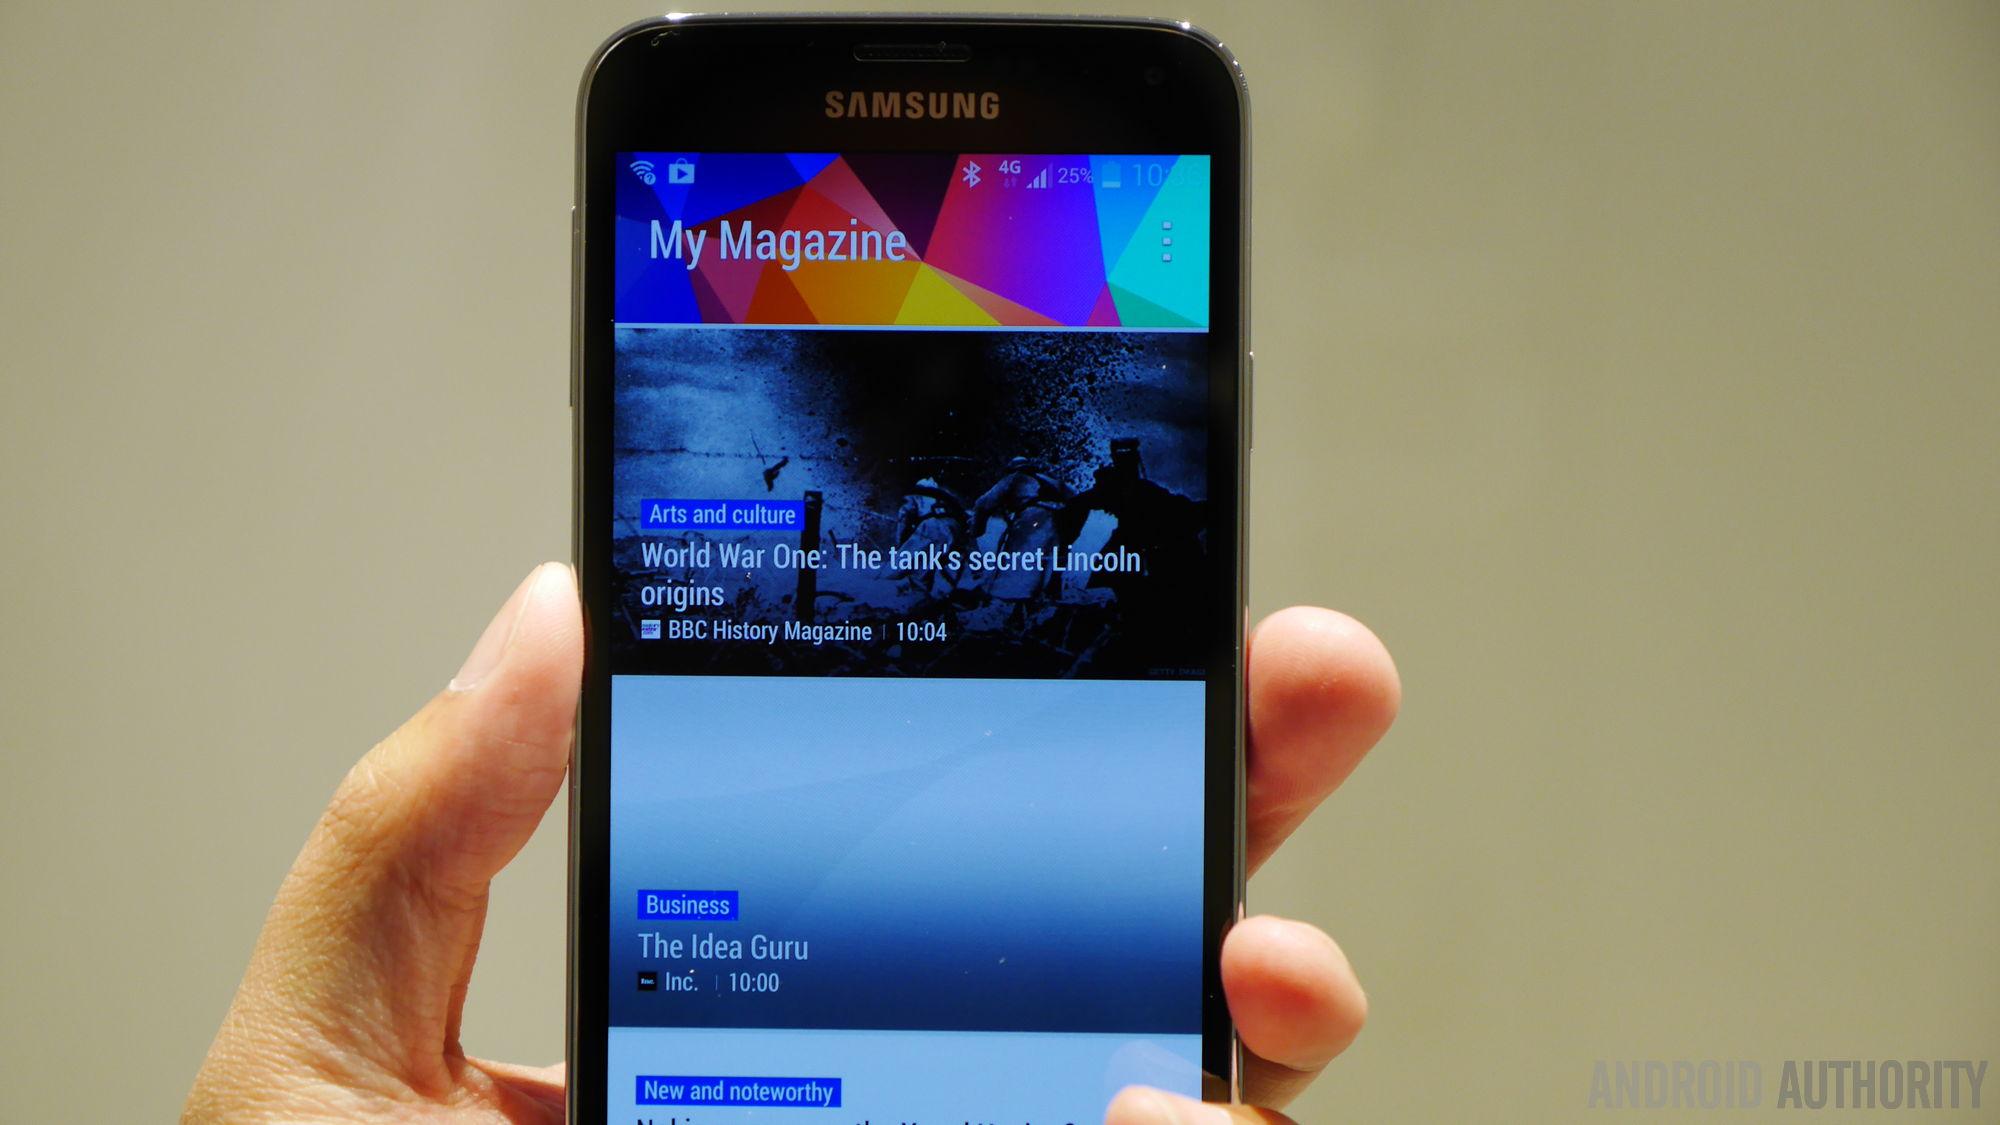 Samsung galaxy s5 unveiled - Samsung Galaxy S5 Unveiled 74